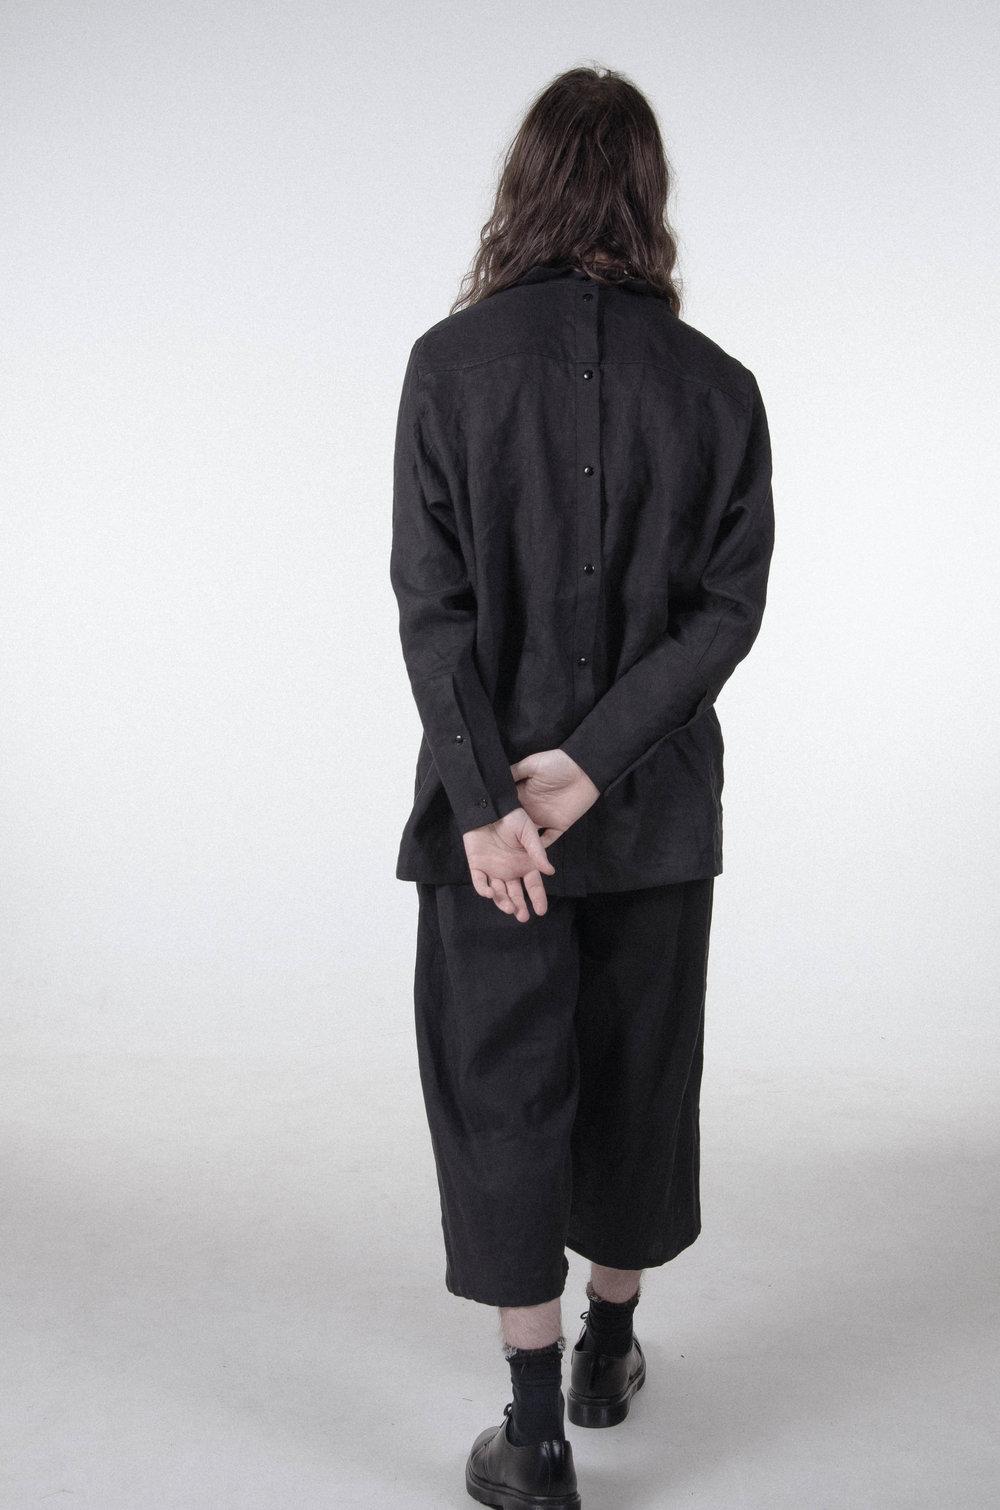 agoraphobia-collective-britt-pooley-backwards-collar-identity-shirt